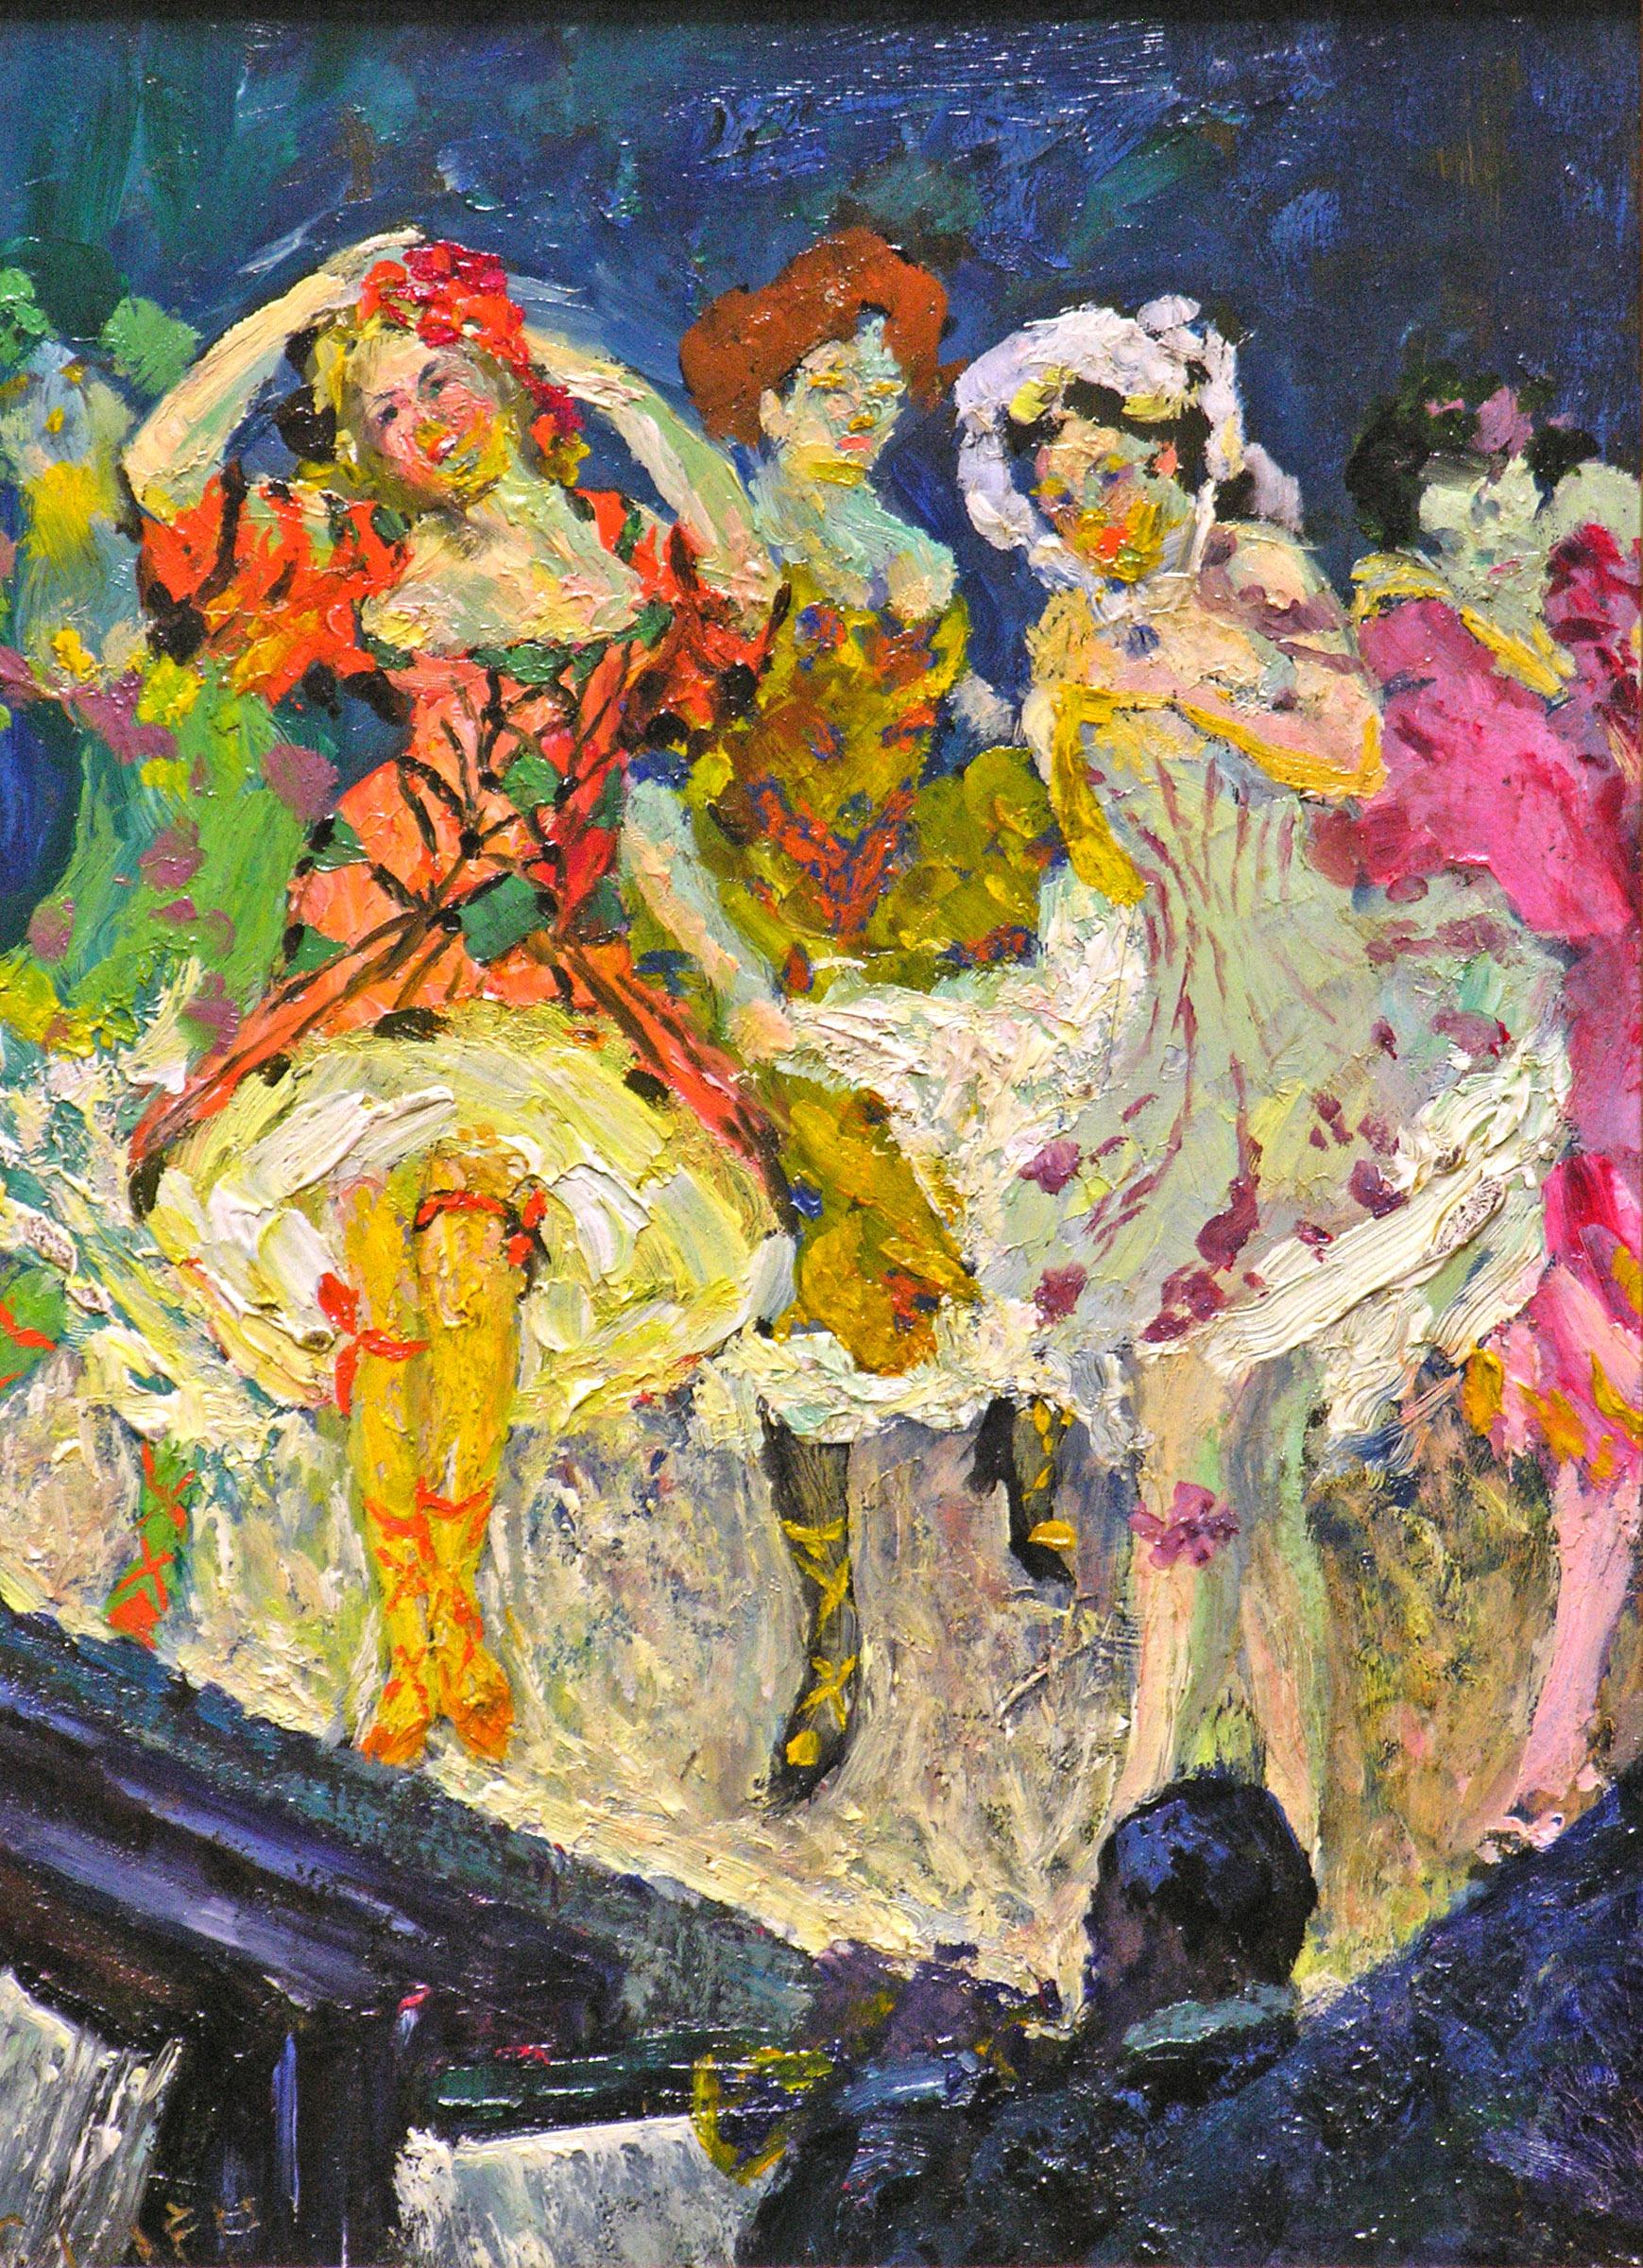 William H. Clapp | Danseuses de cancan, Paris, vers 1910 | huile 9.3/4 x 7.1/4 po.